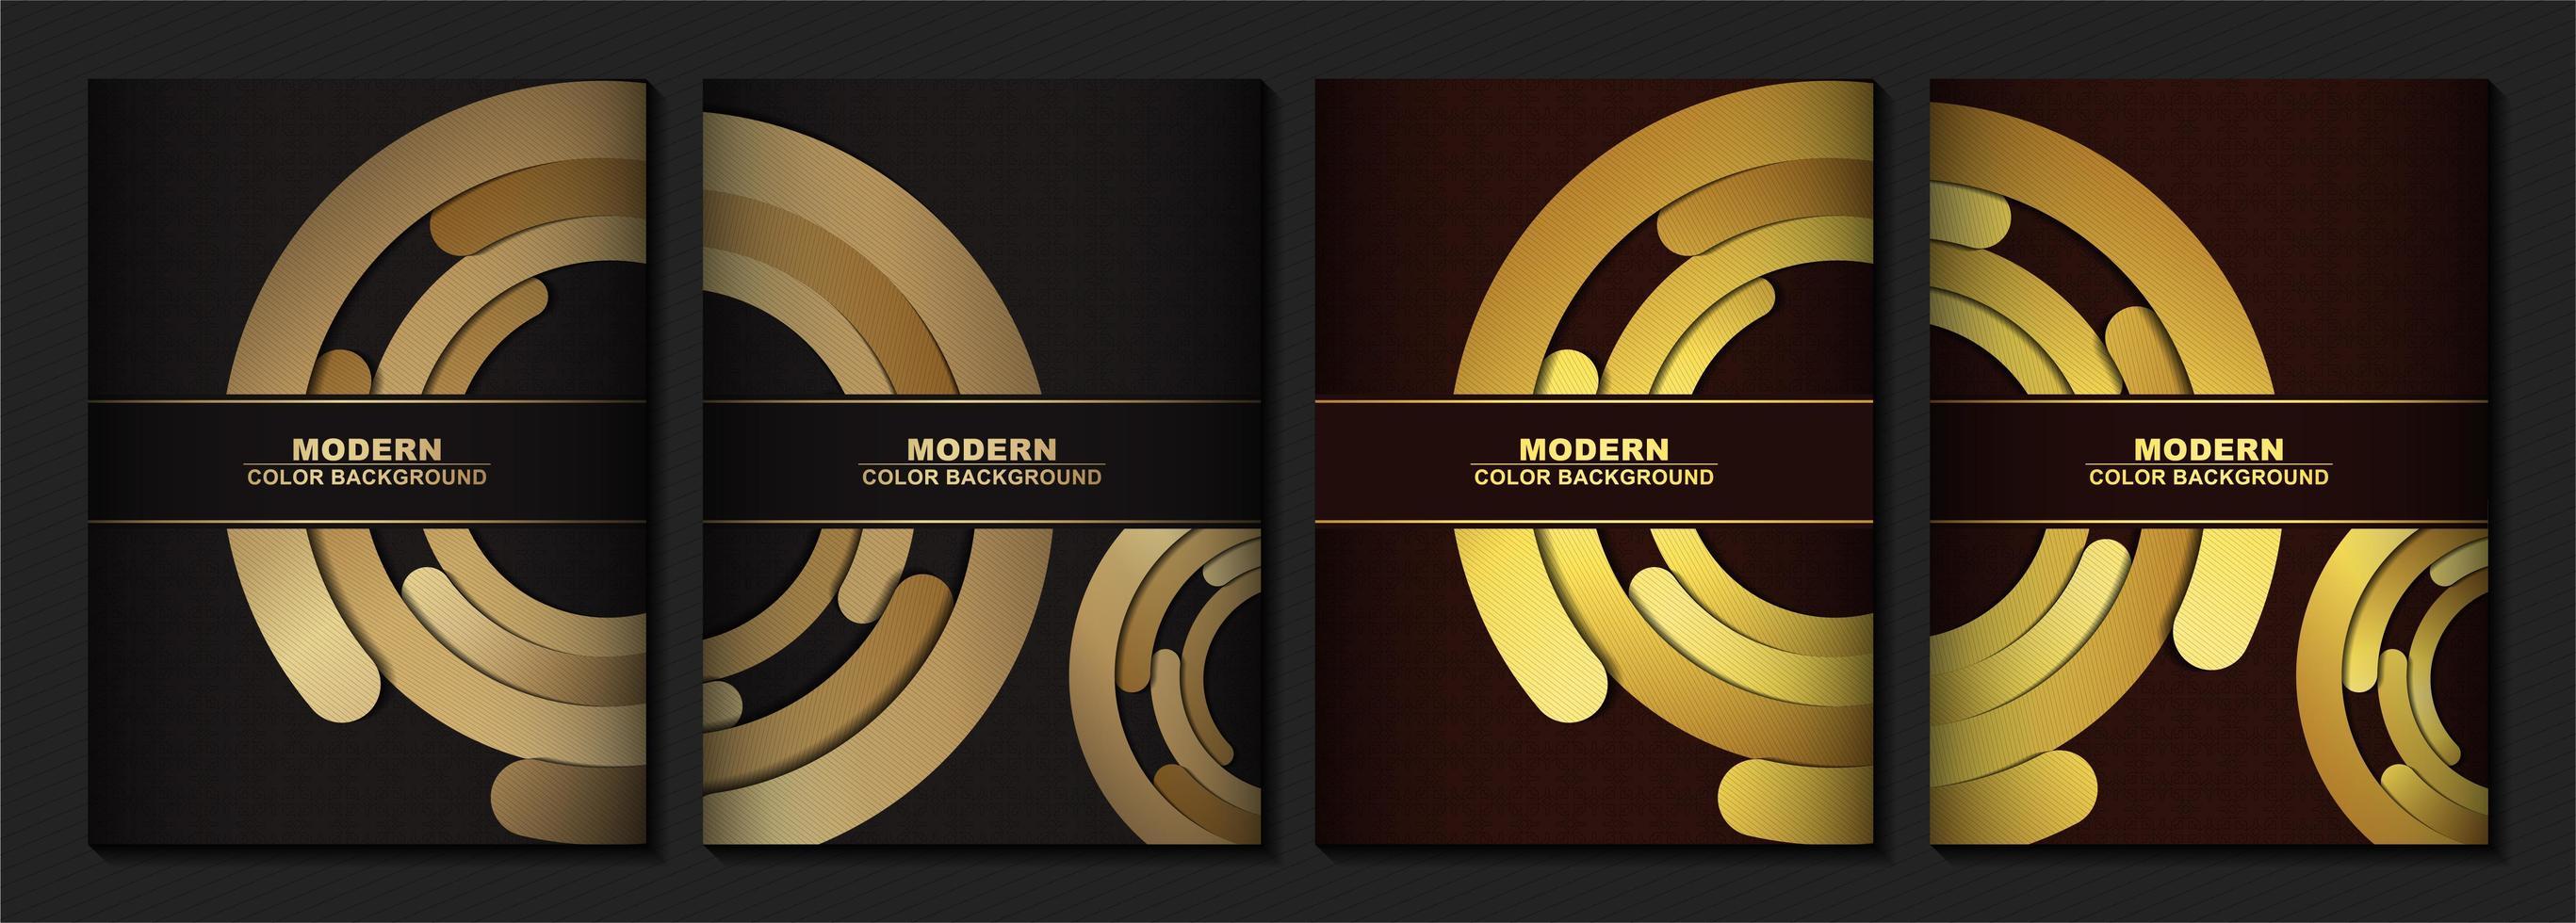 cubierta moderna en oro vector